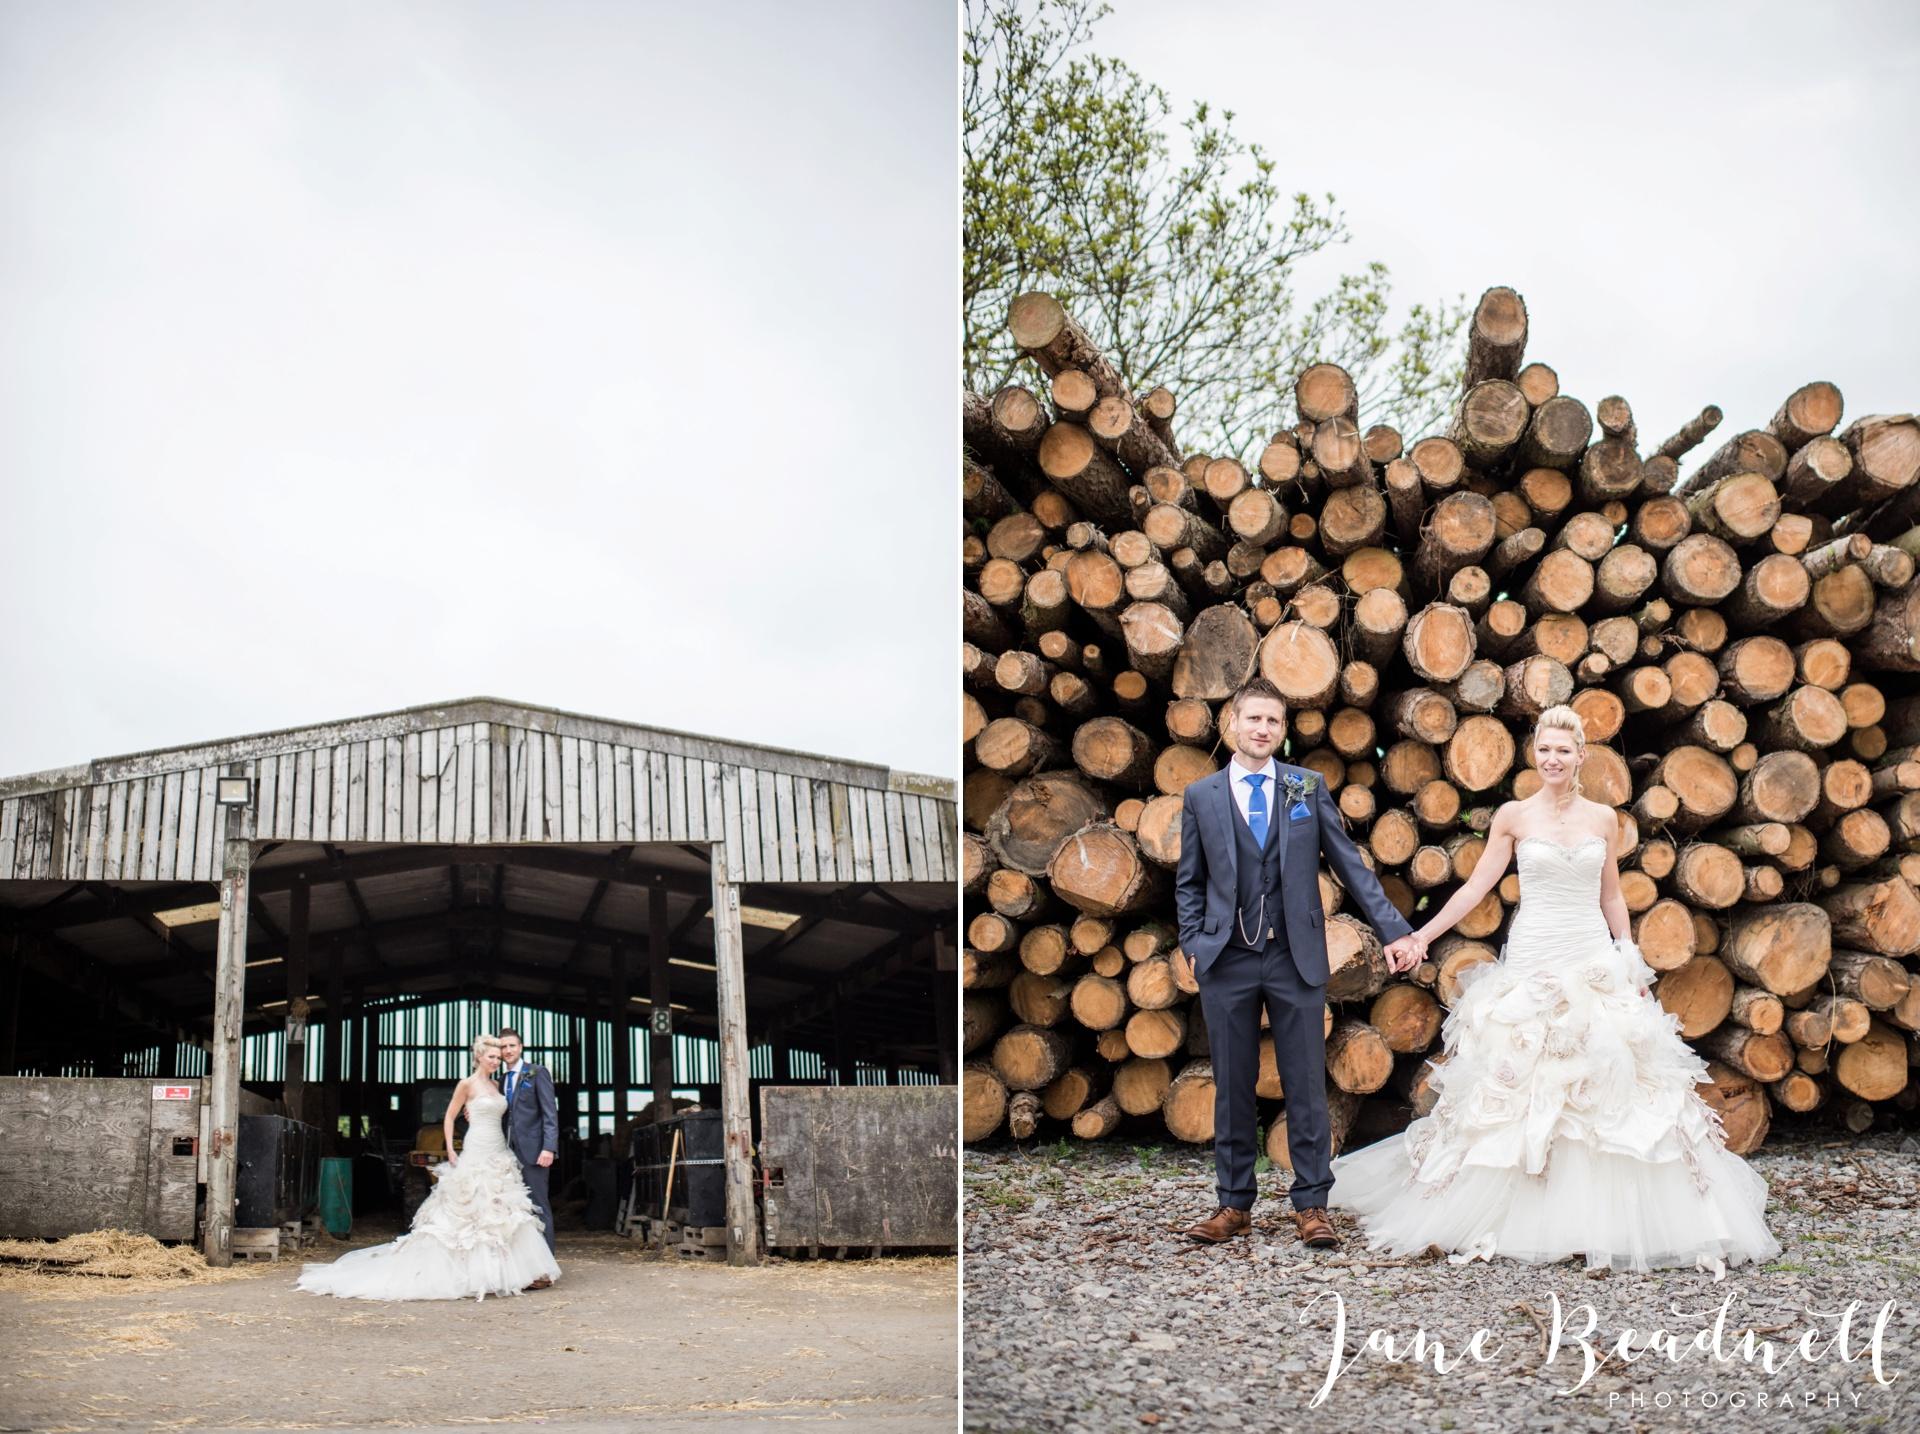 Hill Top Farm Wedding Photography Masham by Jane Beadnell Photography_0063